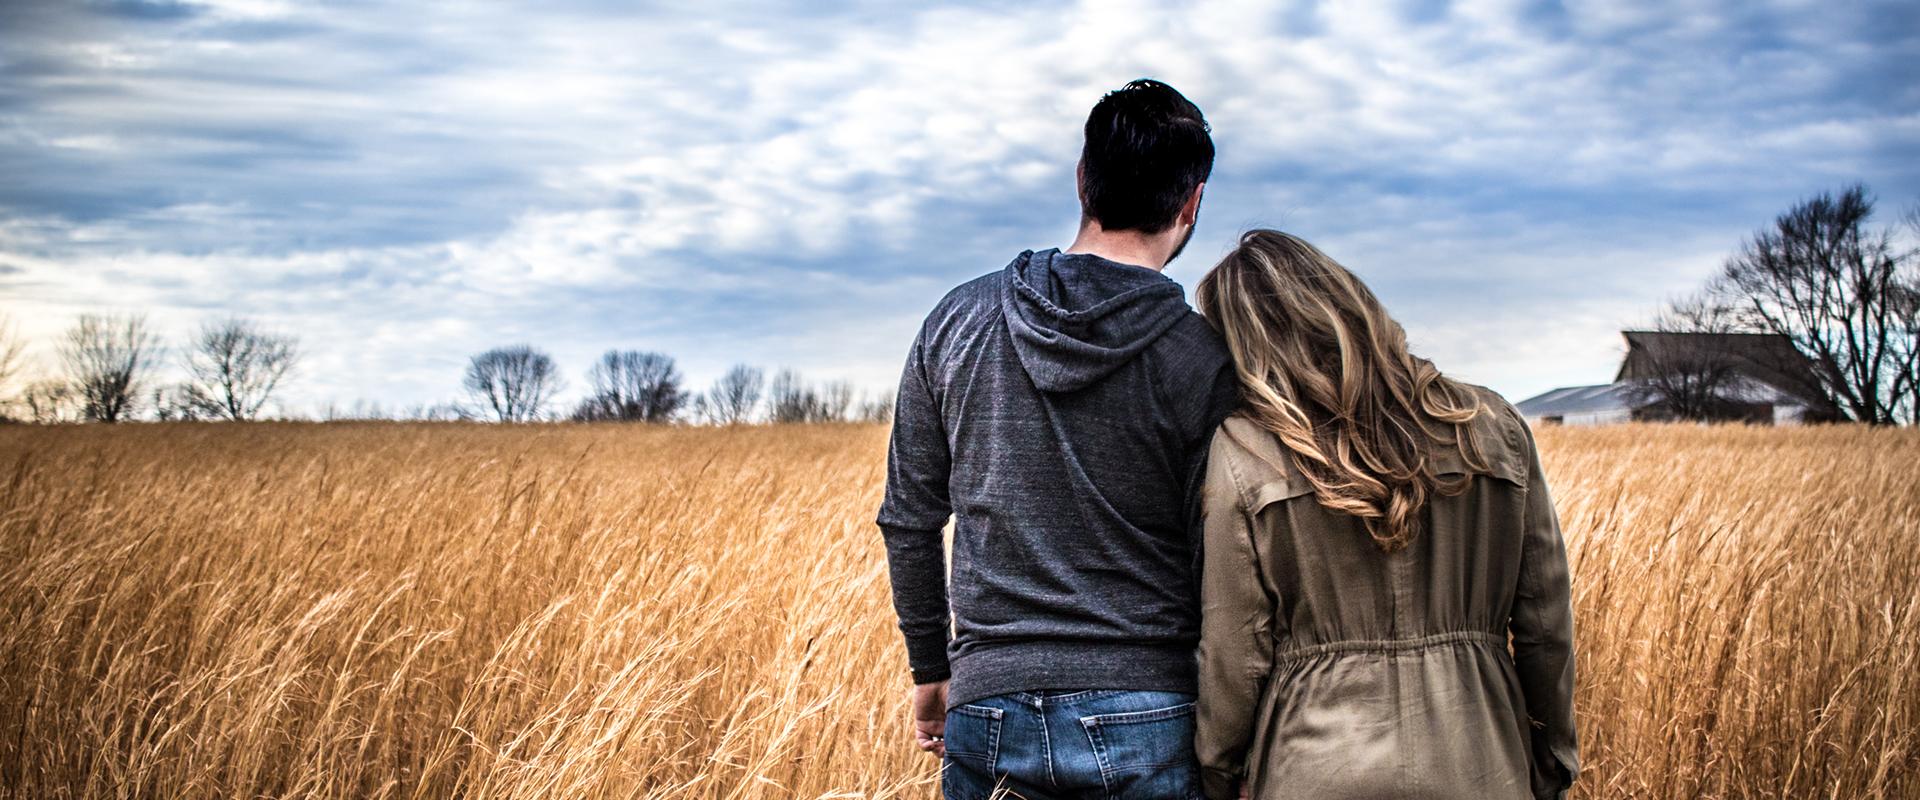 Draper Utah Couples Therapy couple 1